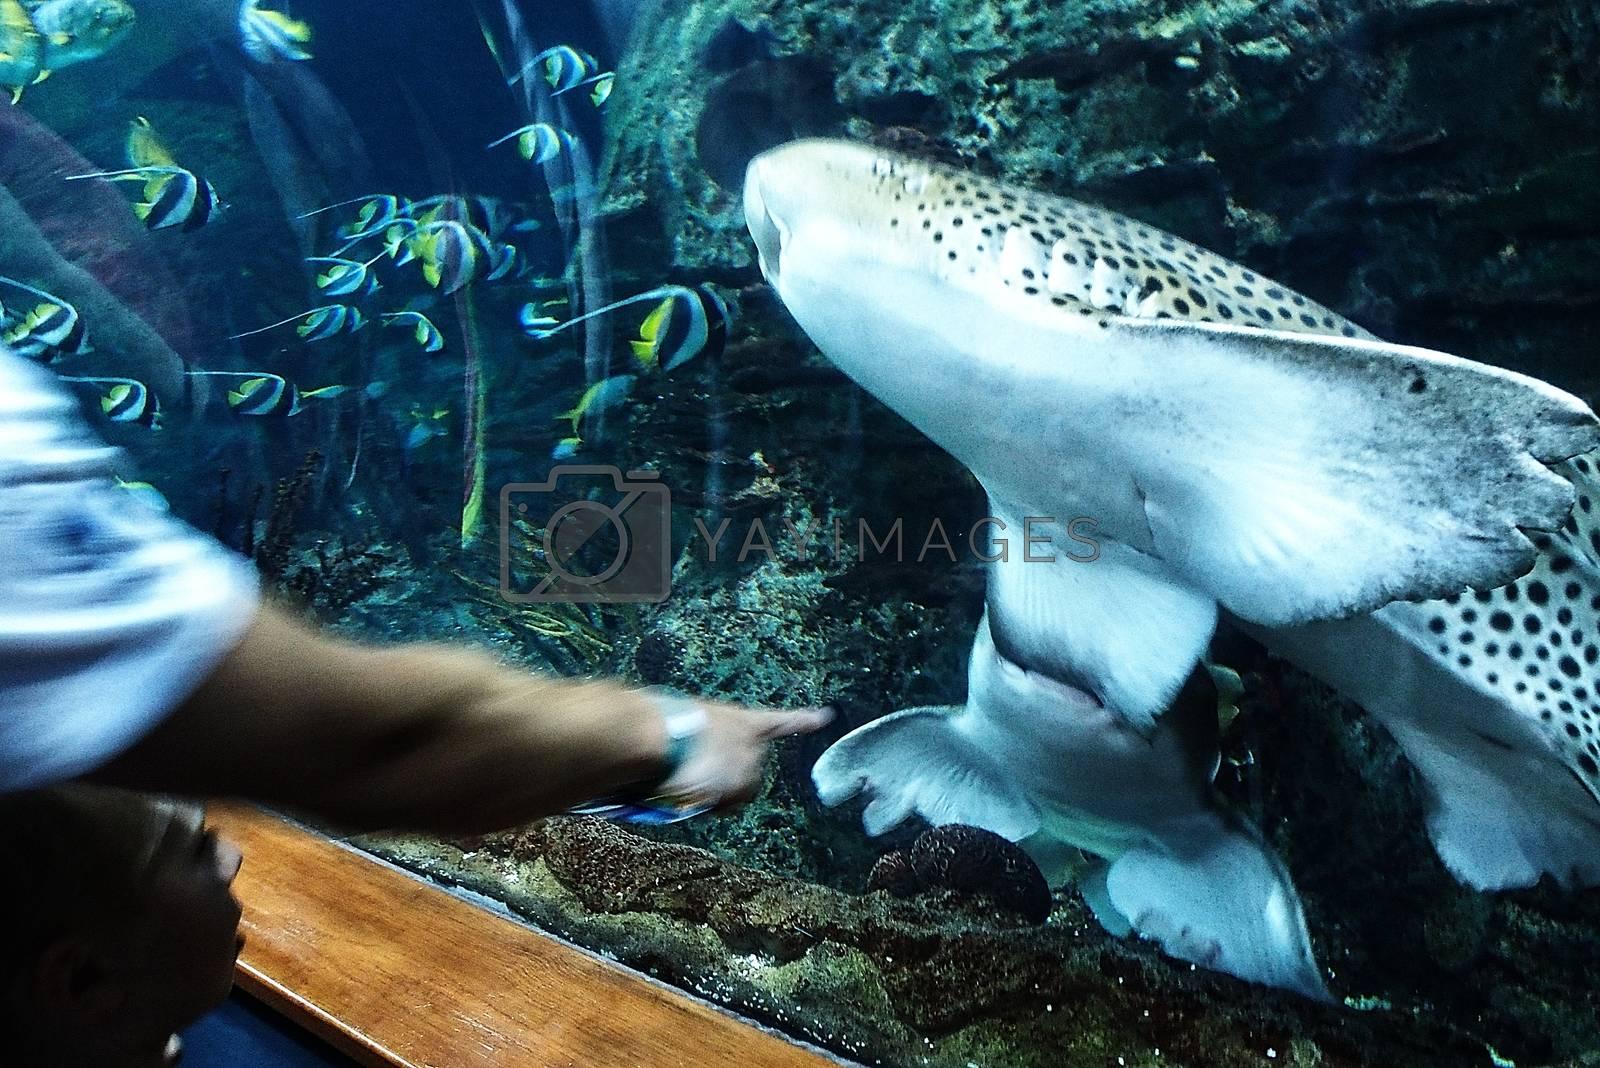 Predatory sharks swimming in a large aquarium at the Tenerife Zoo in Spain